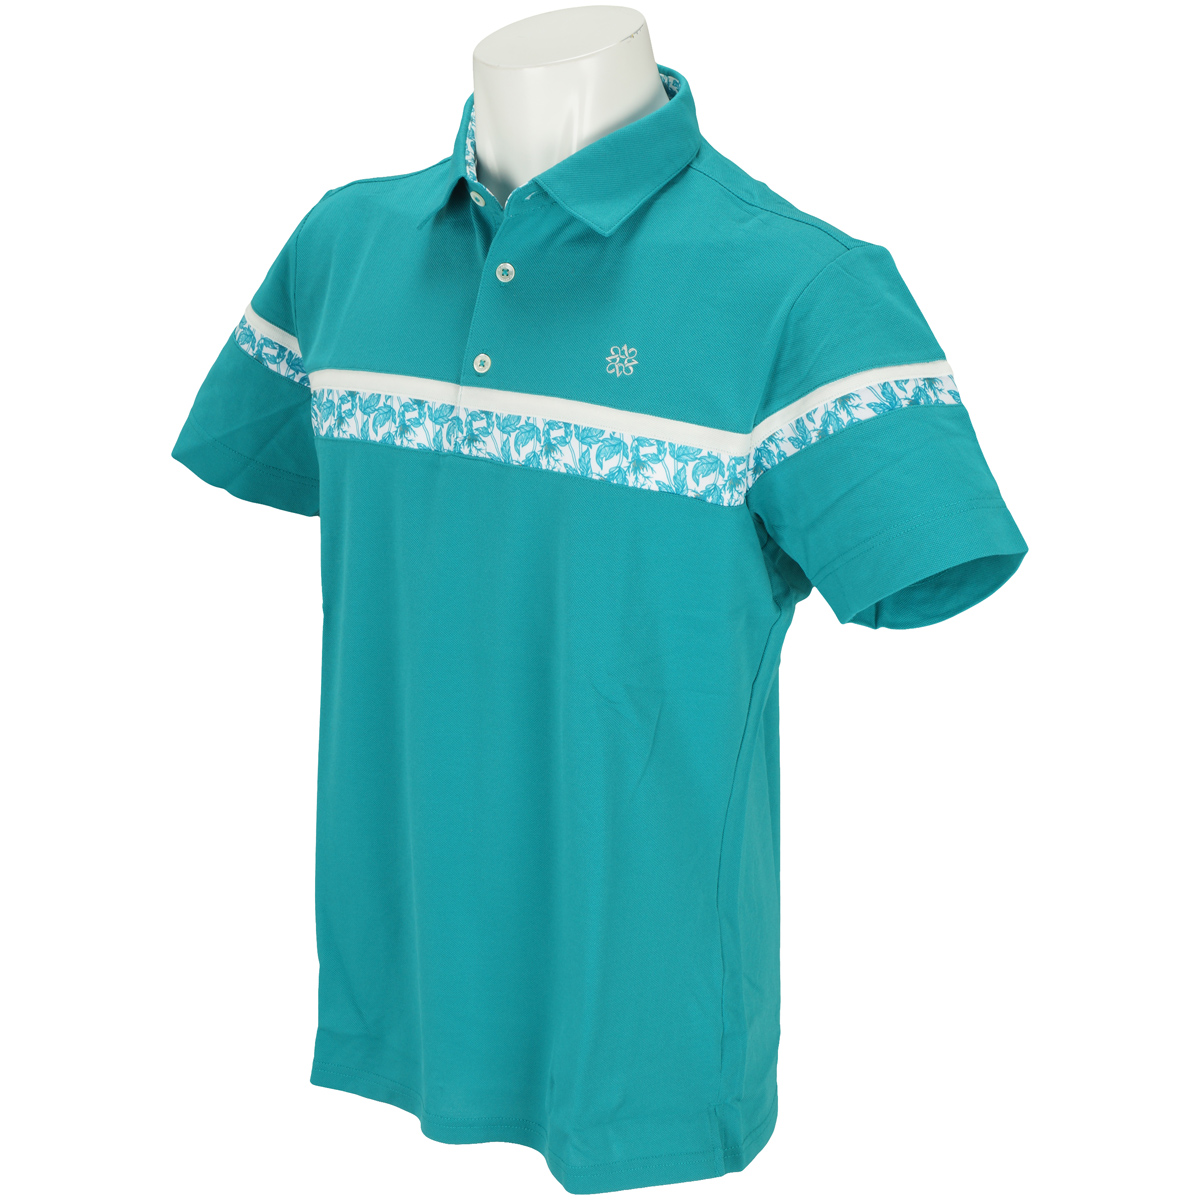 WhiteLabel COOLMAX鹿の子半袖ポロシャツ